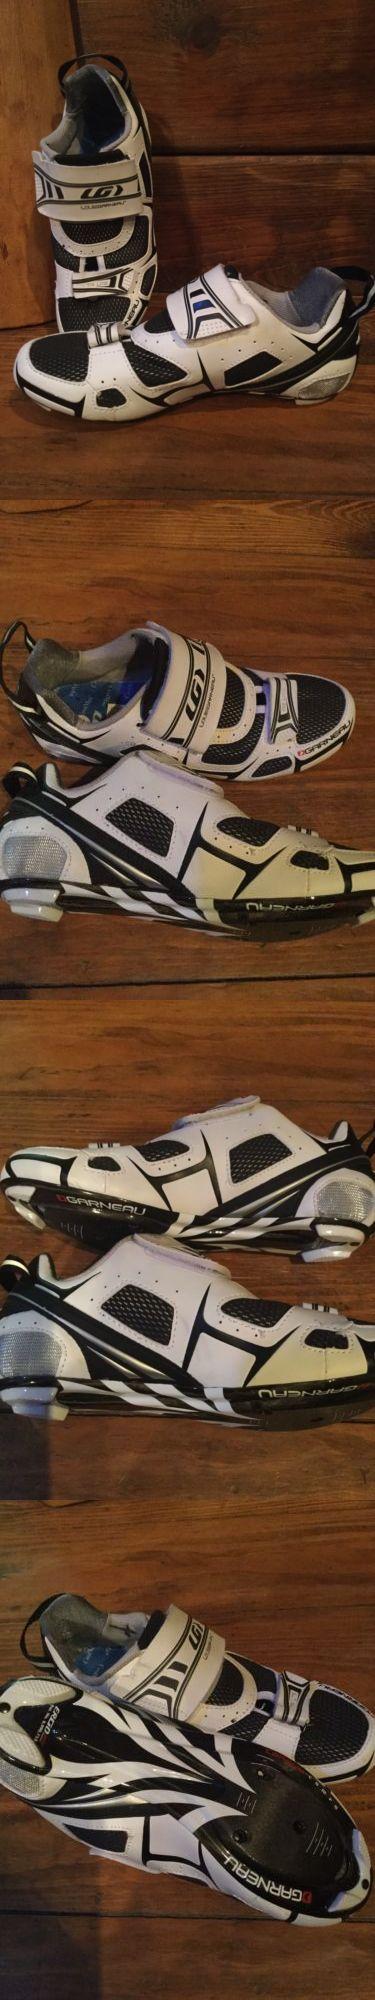 Men 158986: New Louis Garneau Tri Lite Carbon Spd-Sl Cycling Shoes Eu 37 Us 5 Or 6.5 Women -> BUY IT NOW ONLY: $48 on eBay!